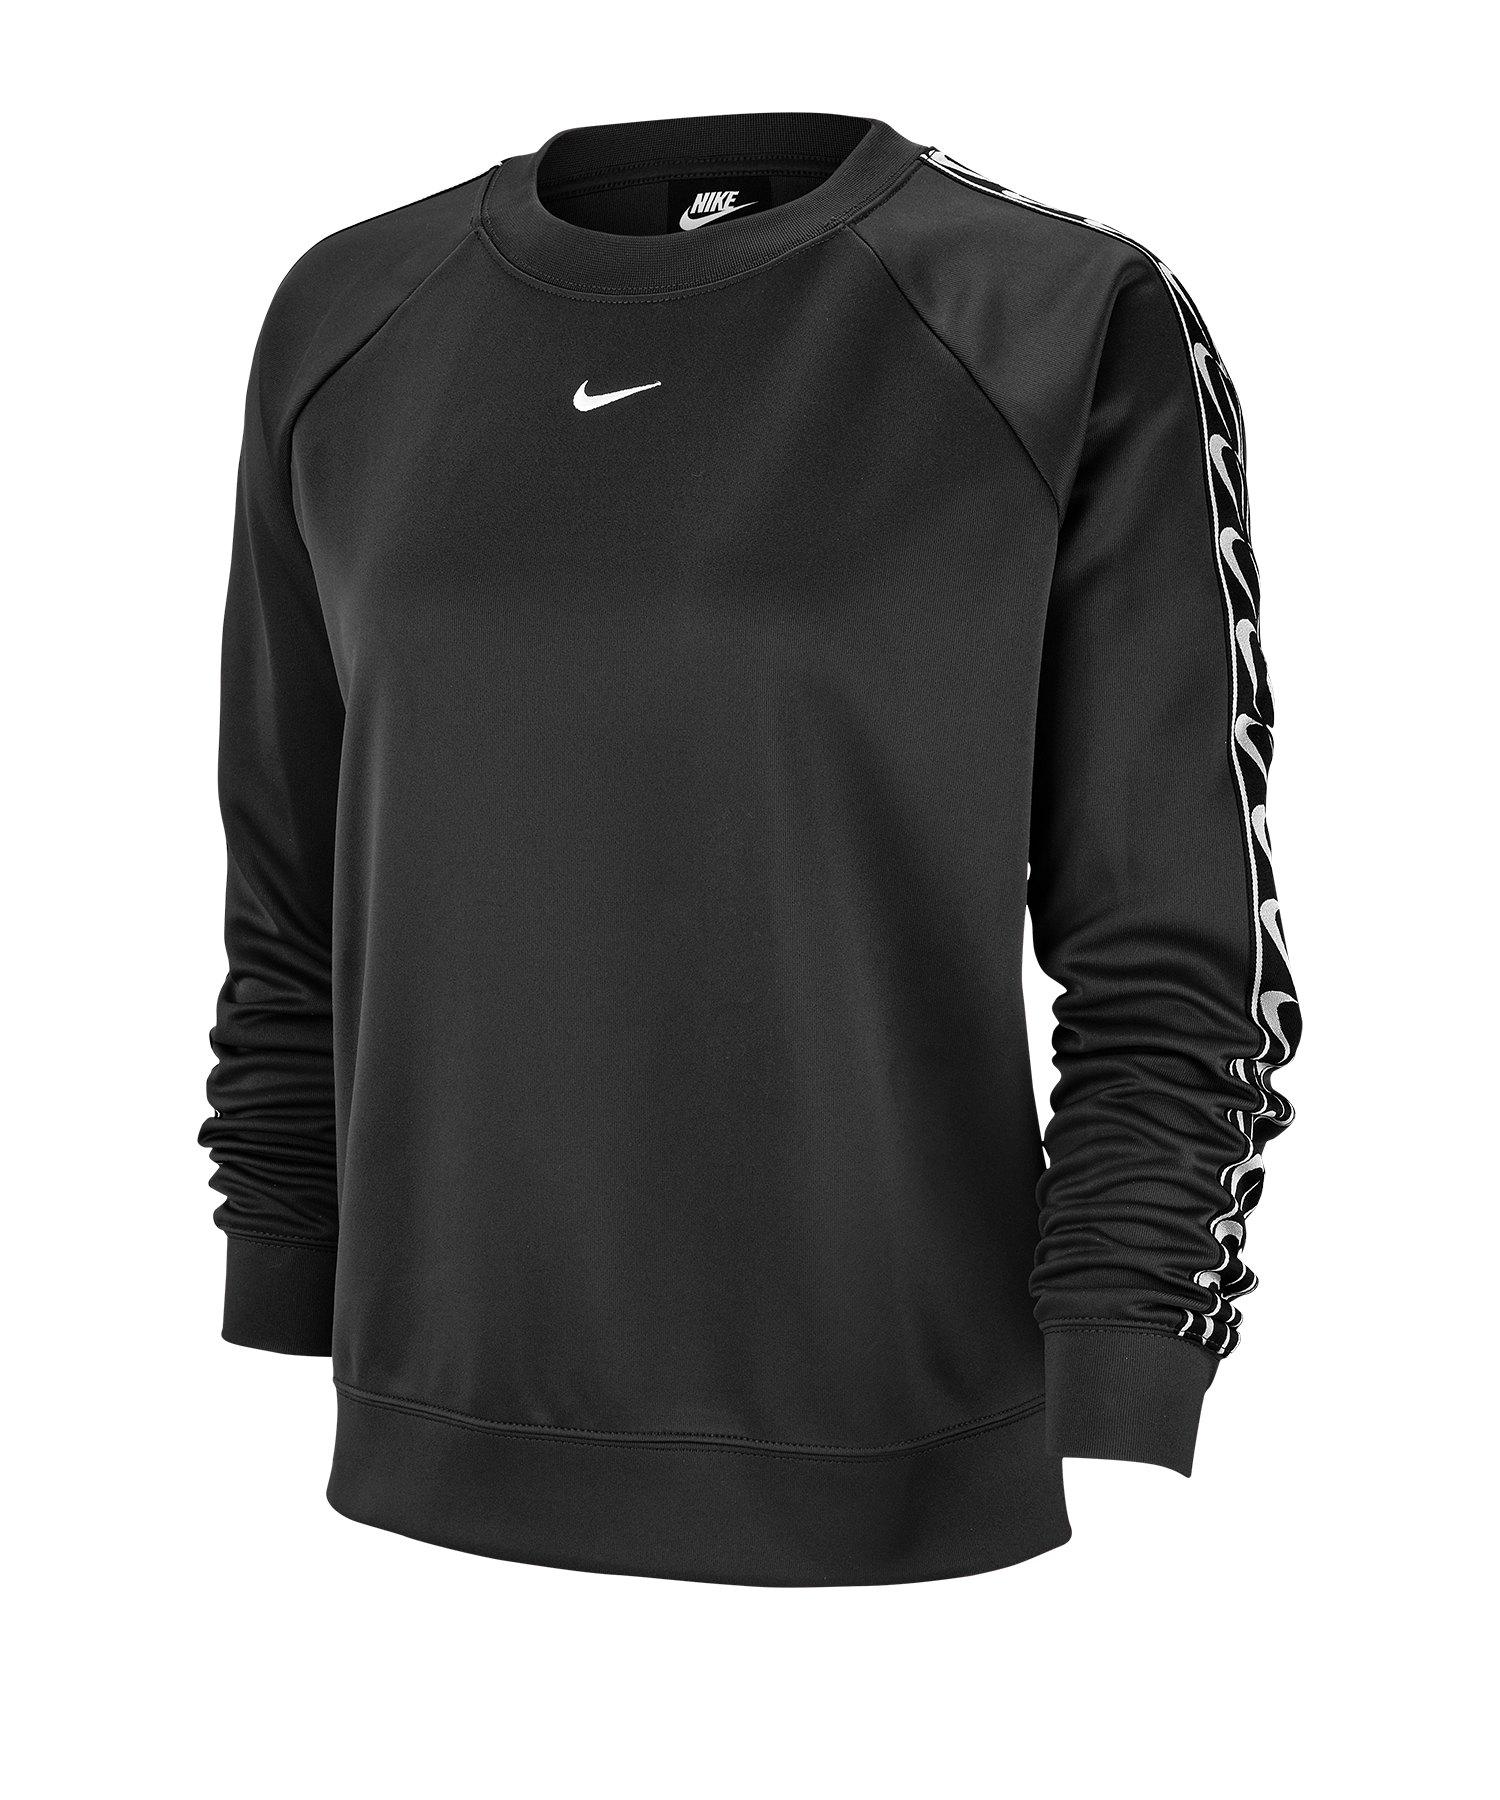 Nike Crew Logo Longsleeve Damen Schwarz F010 - schwarz